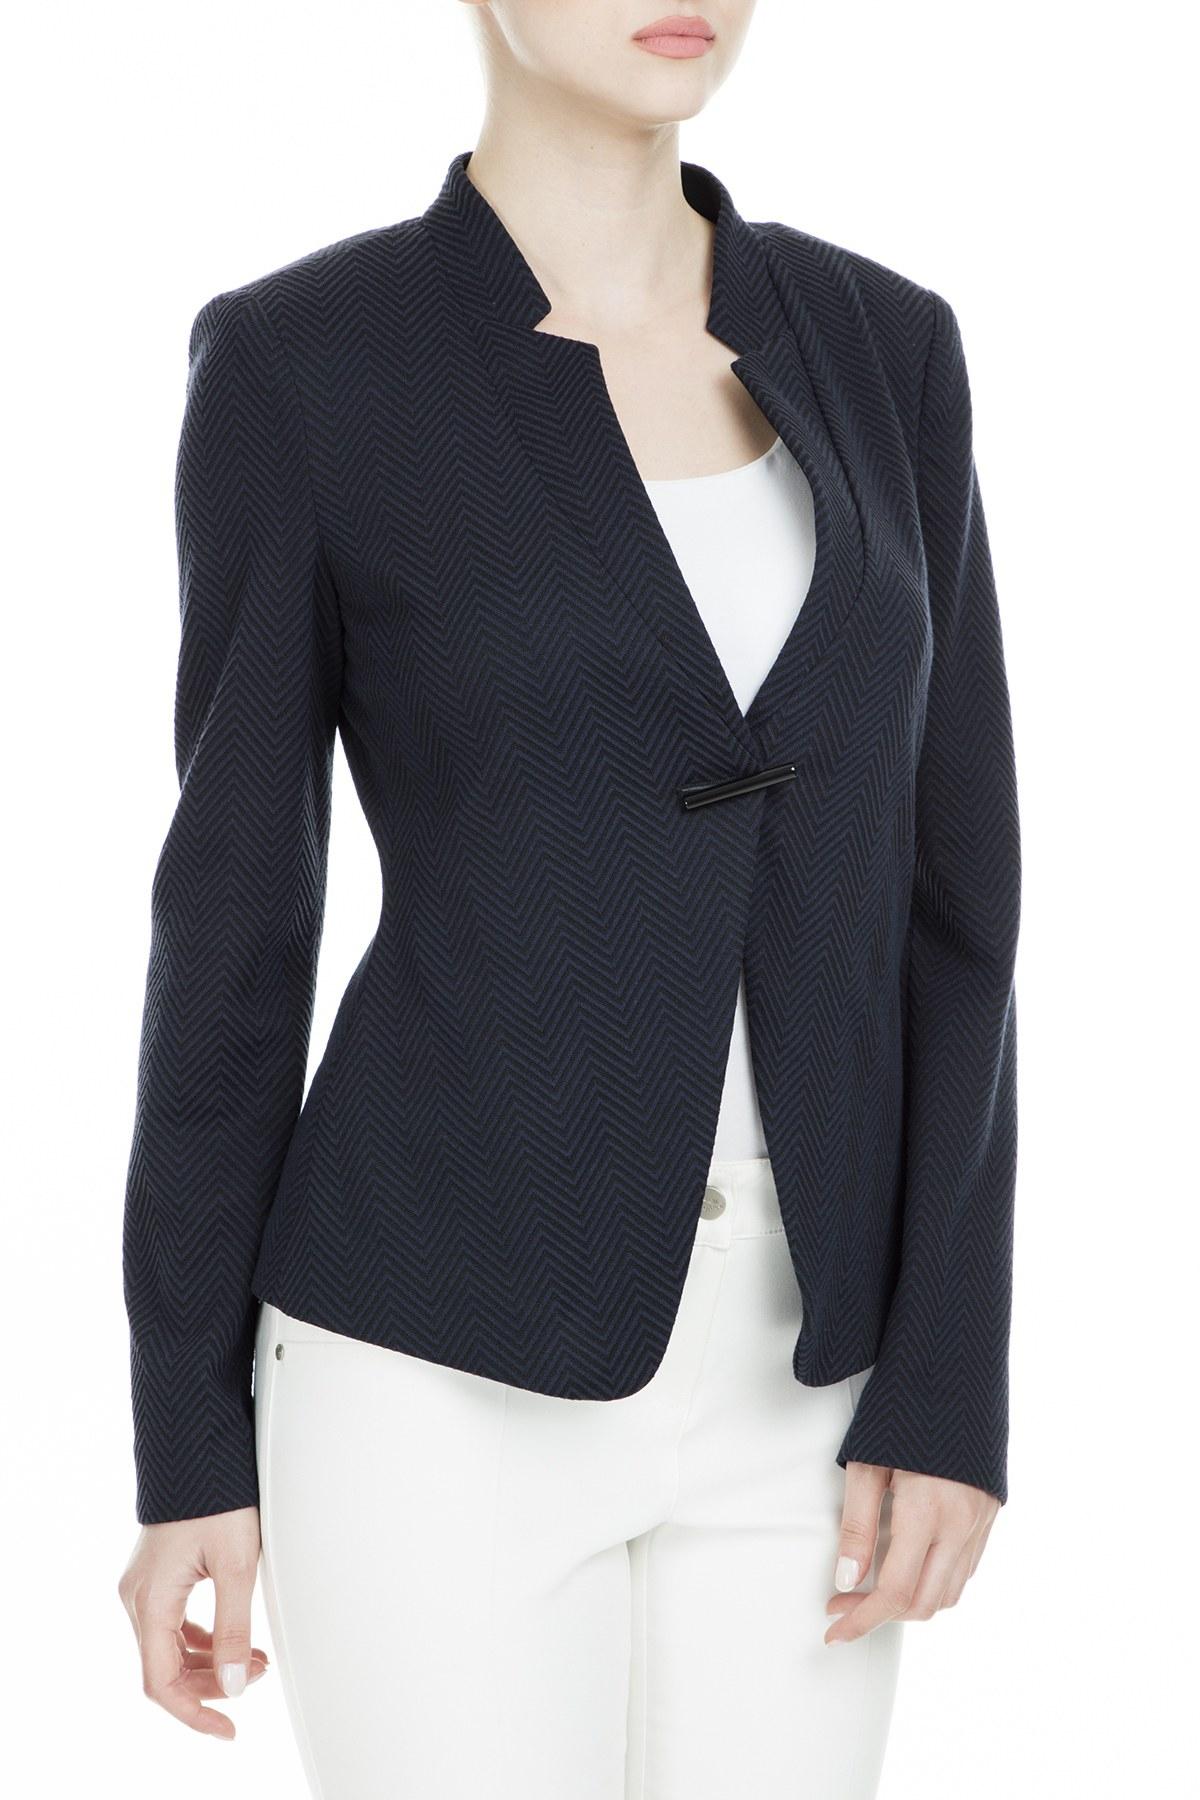 Armani Collezioni Kadın Ceket 3XMG53 MJEEZ C0030 LACİVERT